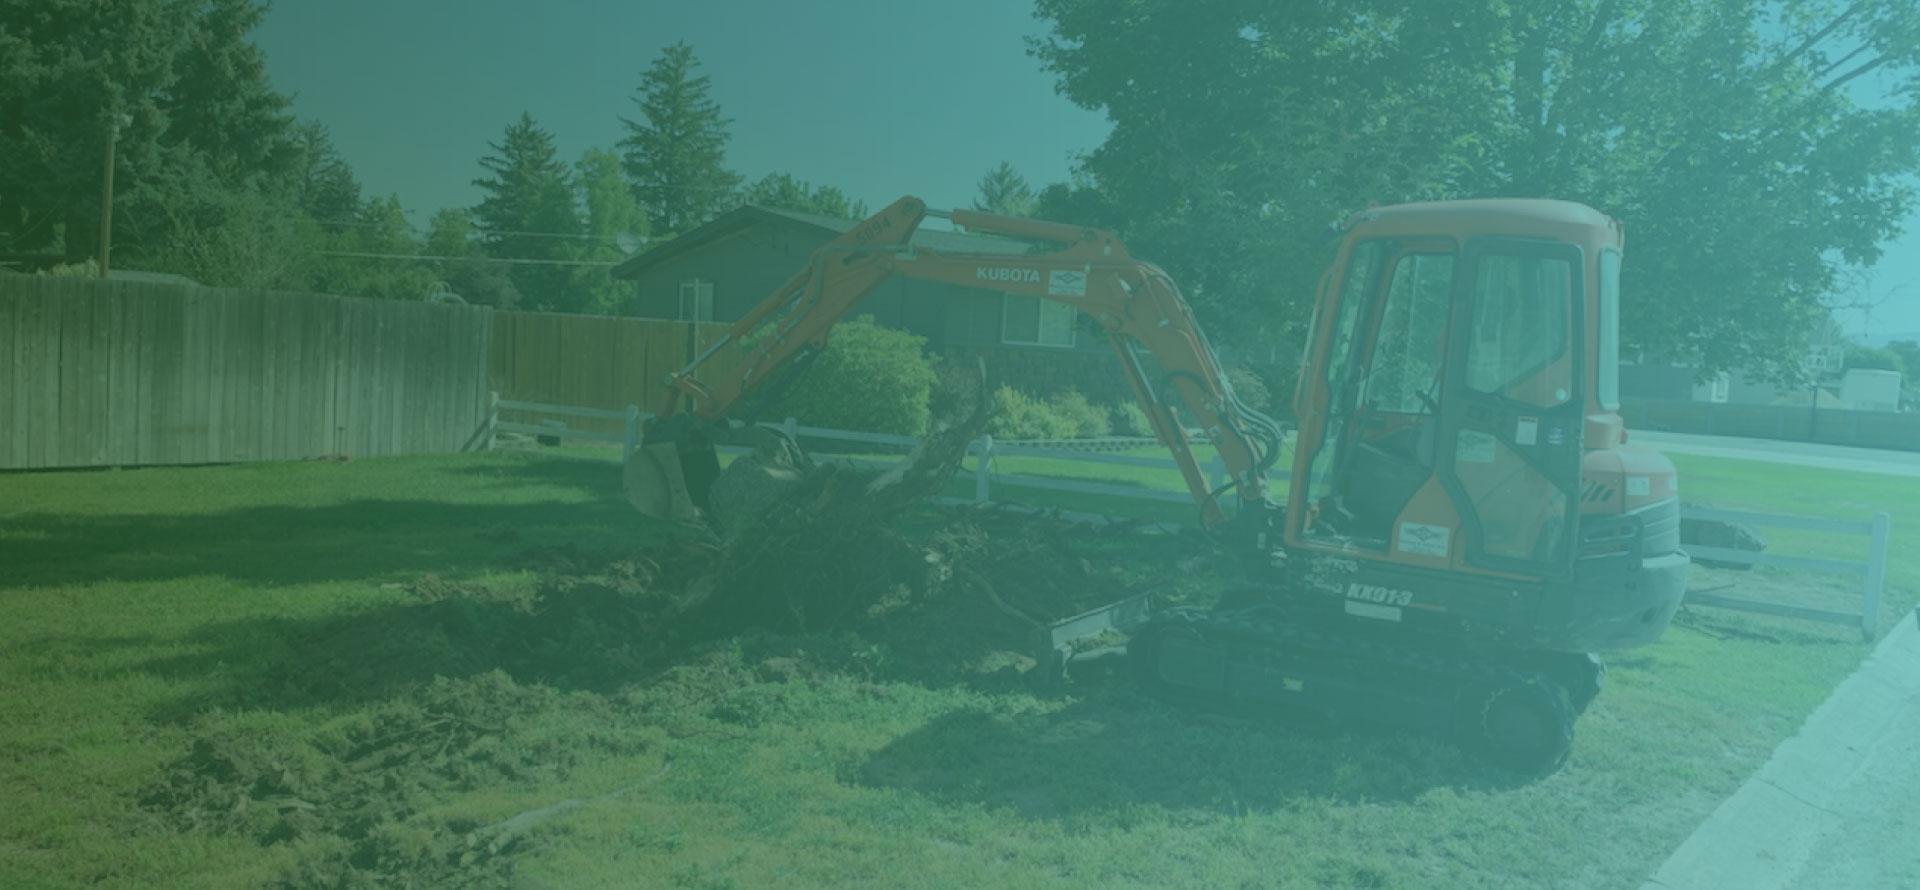 Tree Trimming Boise Tree Removal Boise Boise Arborist